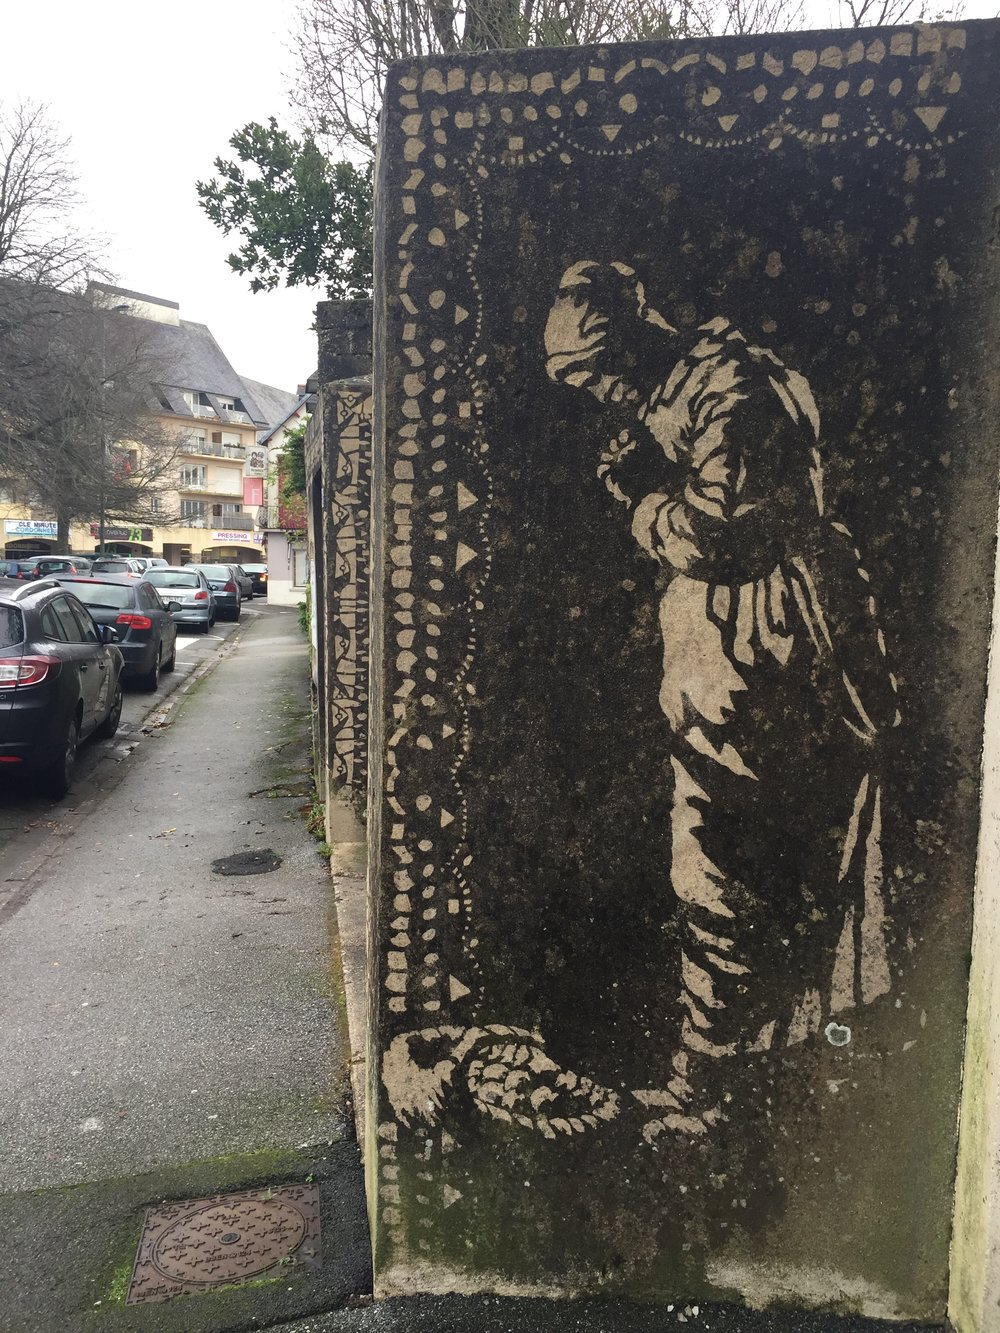 Street Art Carhaix France